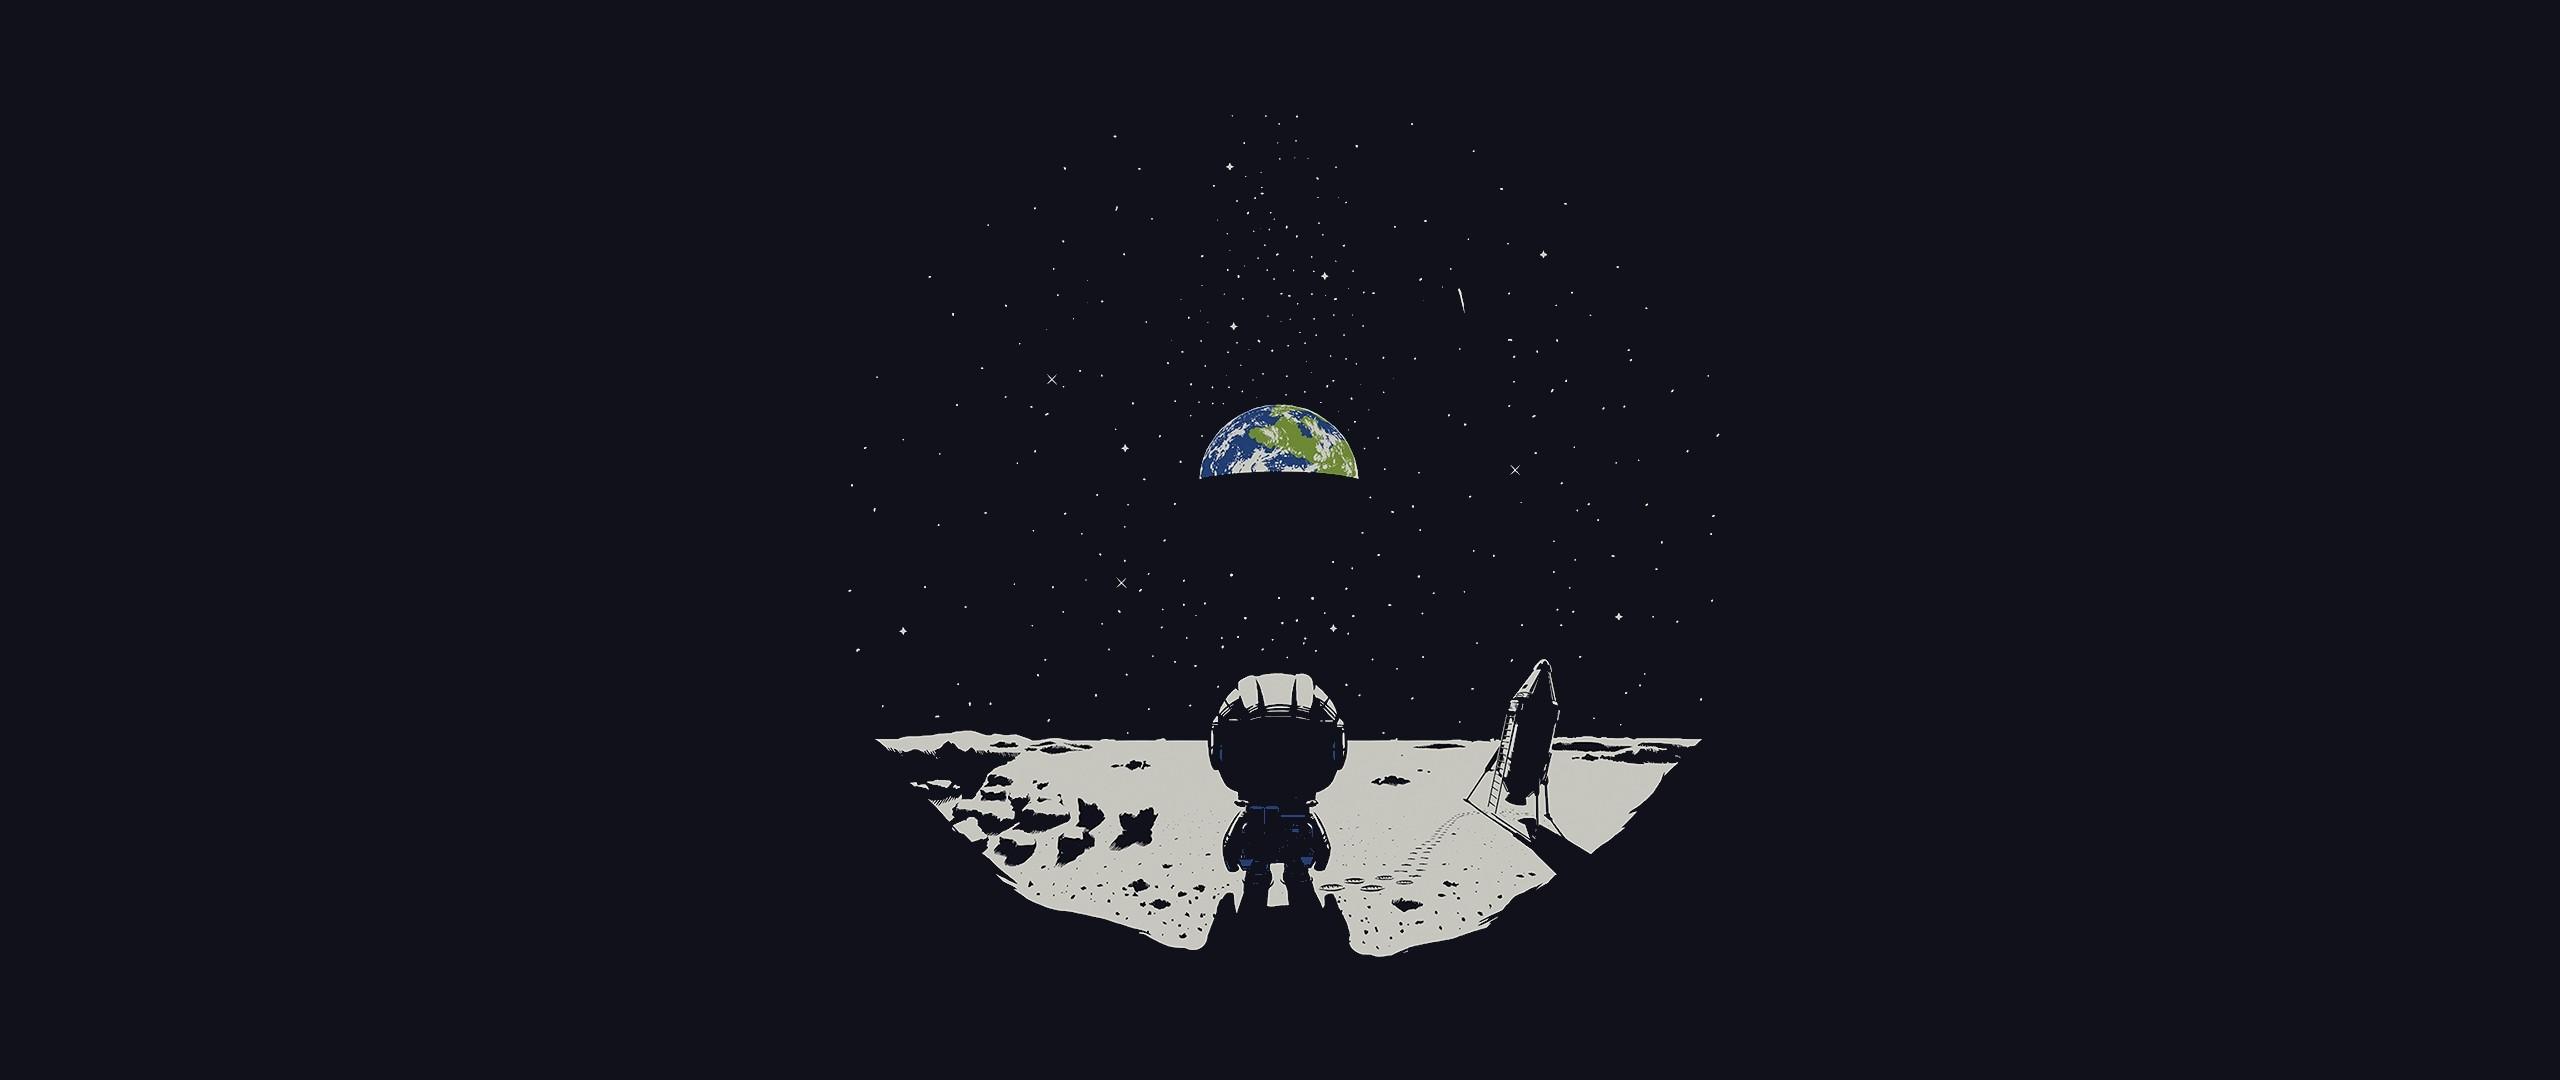 General 2560x1080 ultrawide space Moon Earth Kerbal Space Program ultra-wide